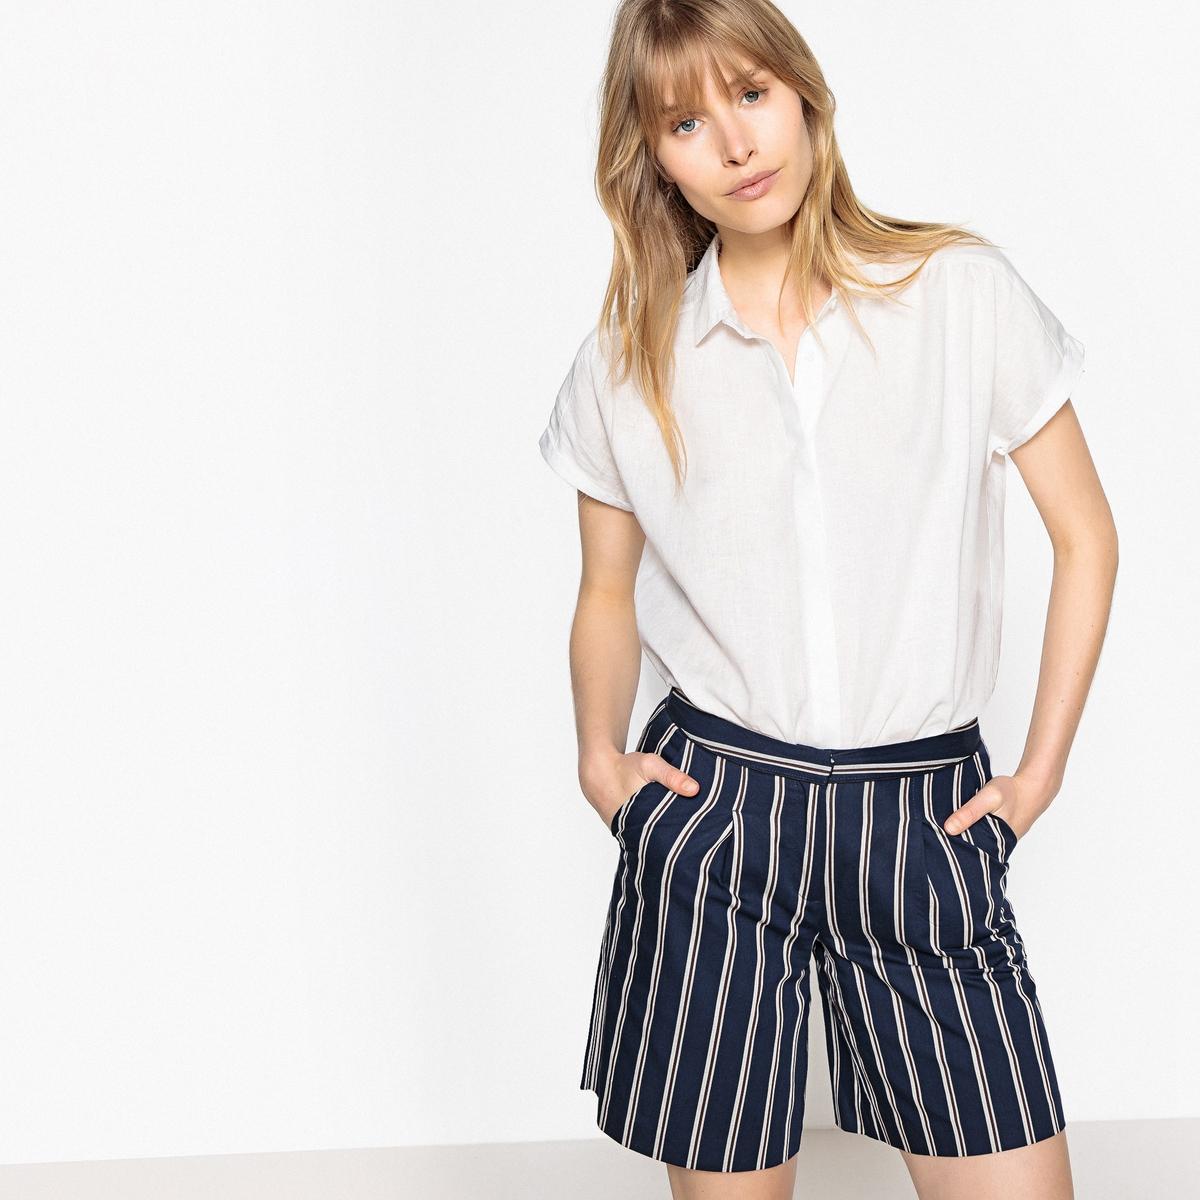 Camisa de lino, manga corta